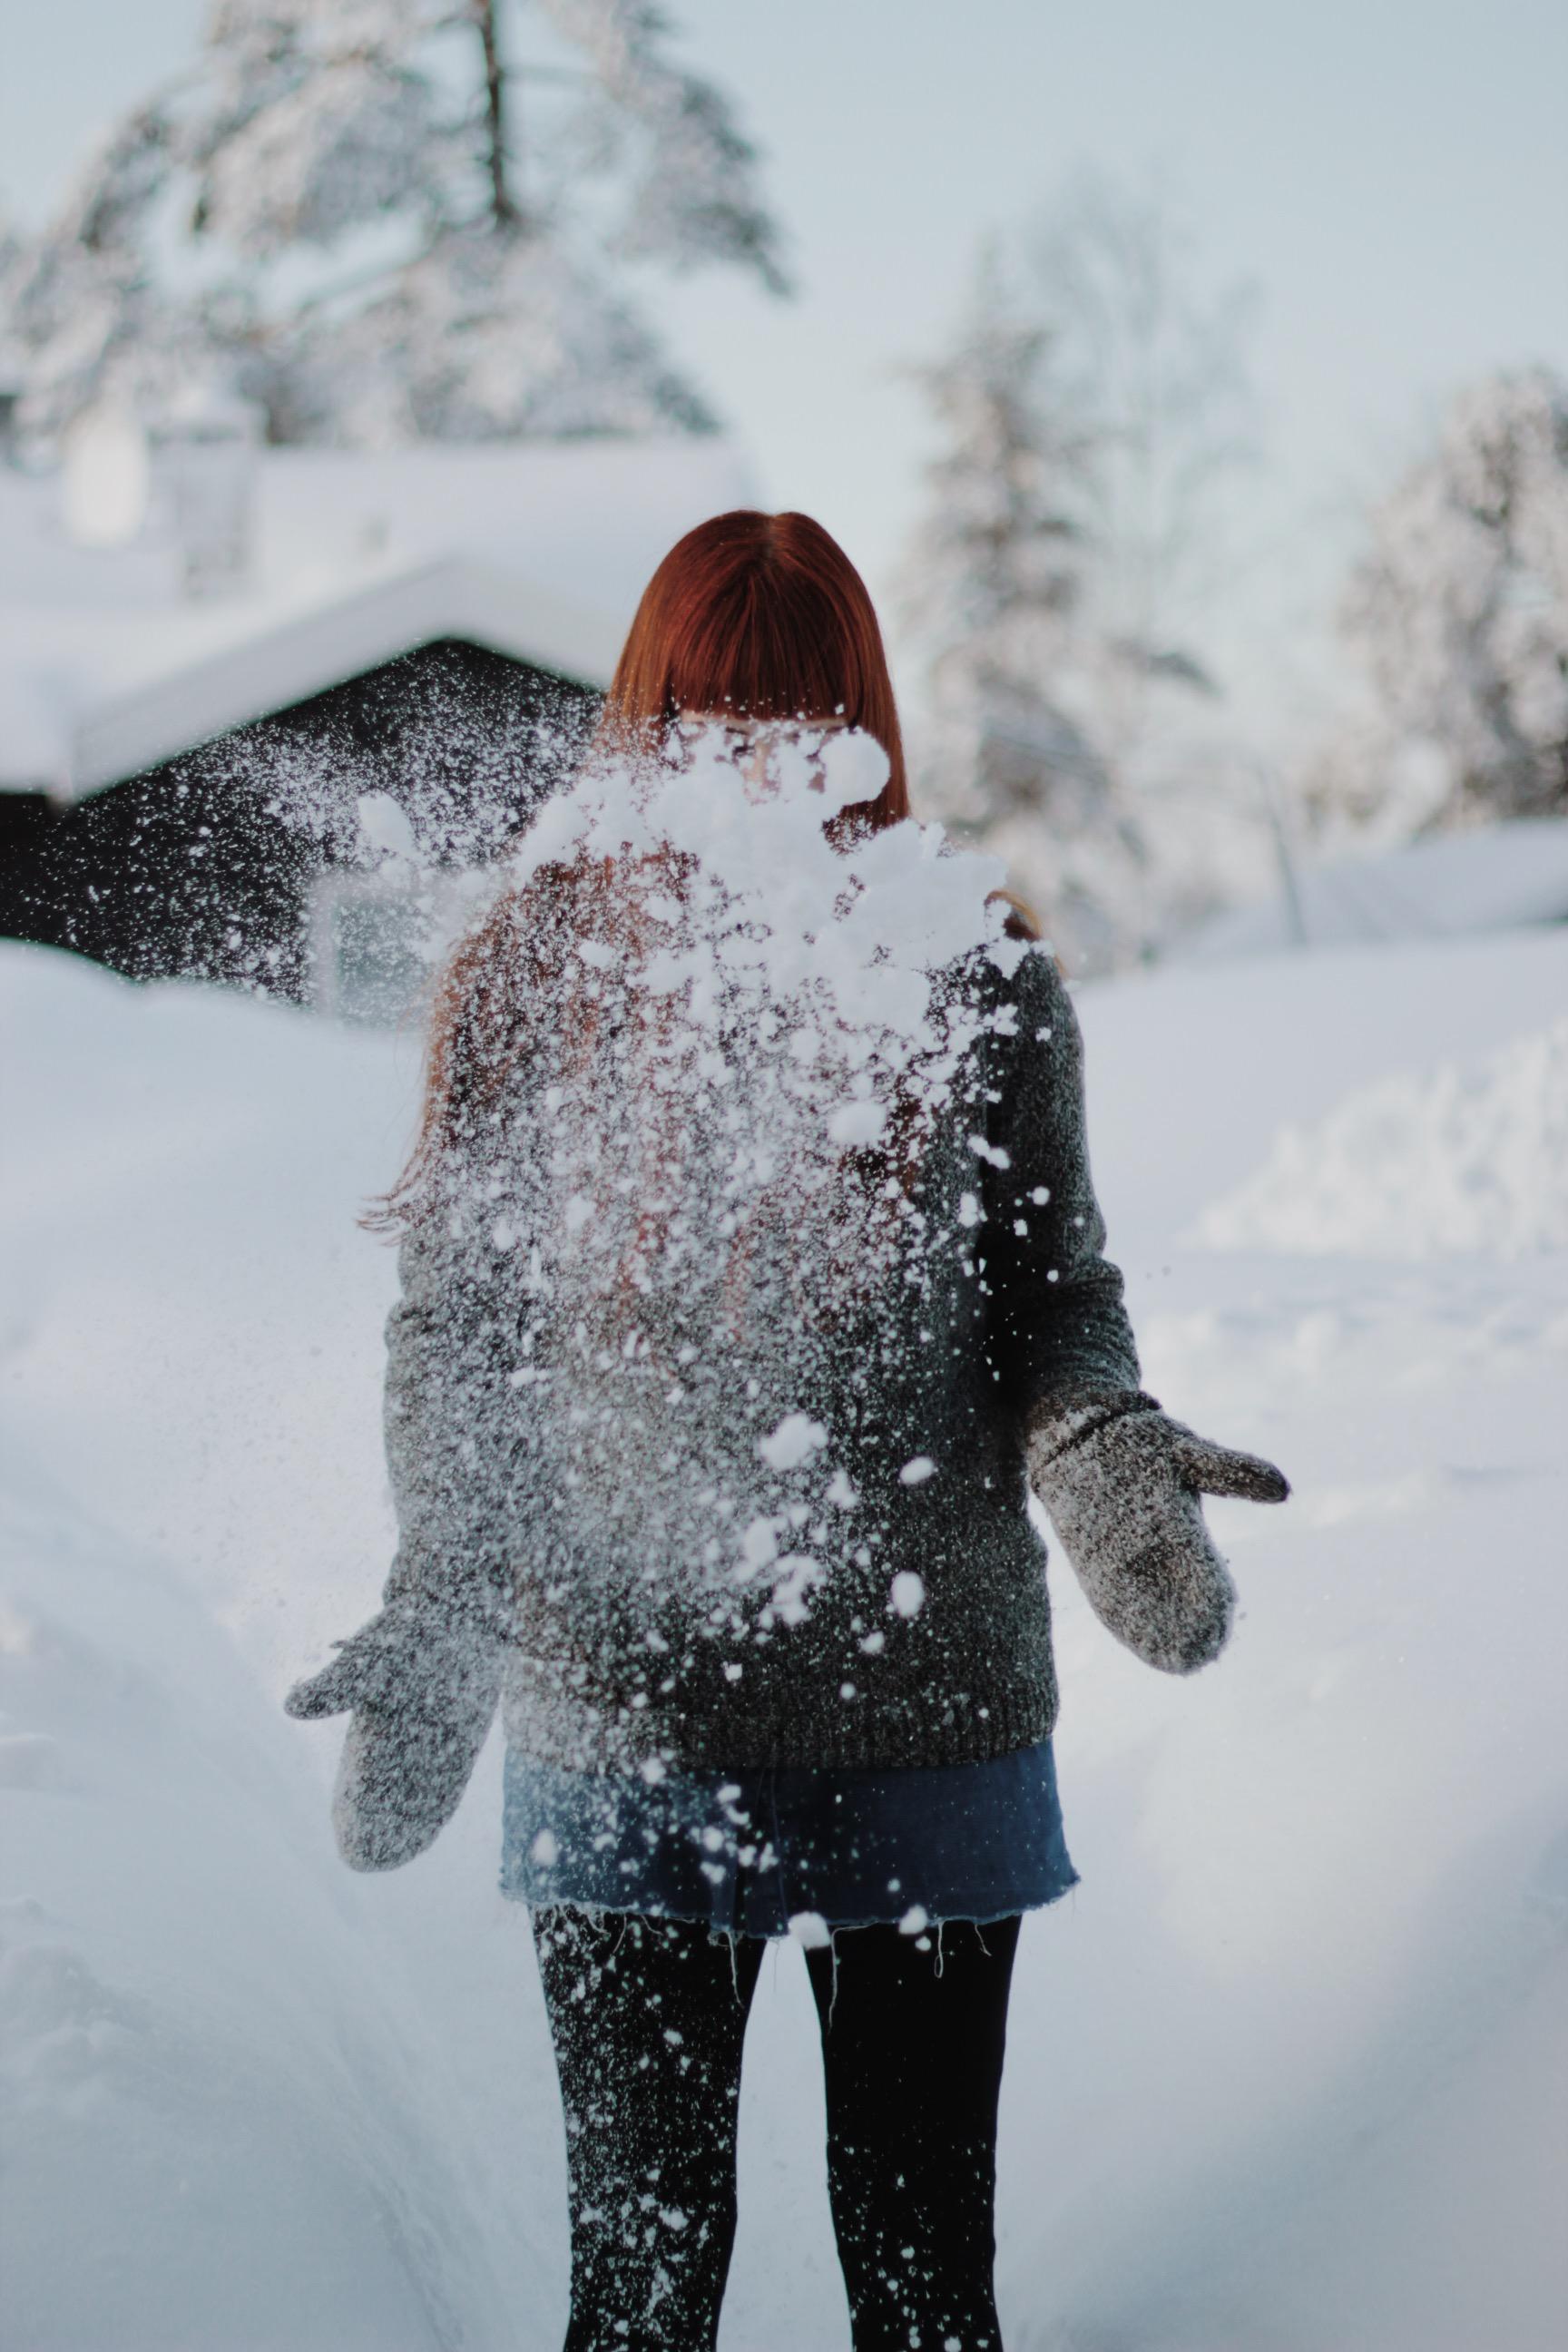 Girl throwing snow in air, Oslo, Norway